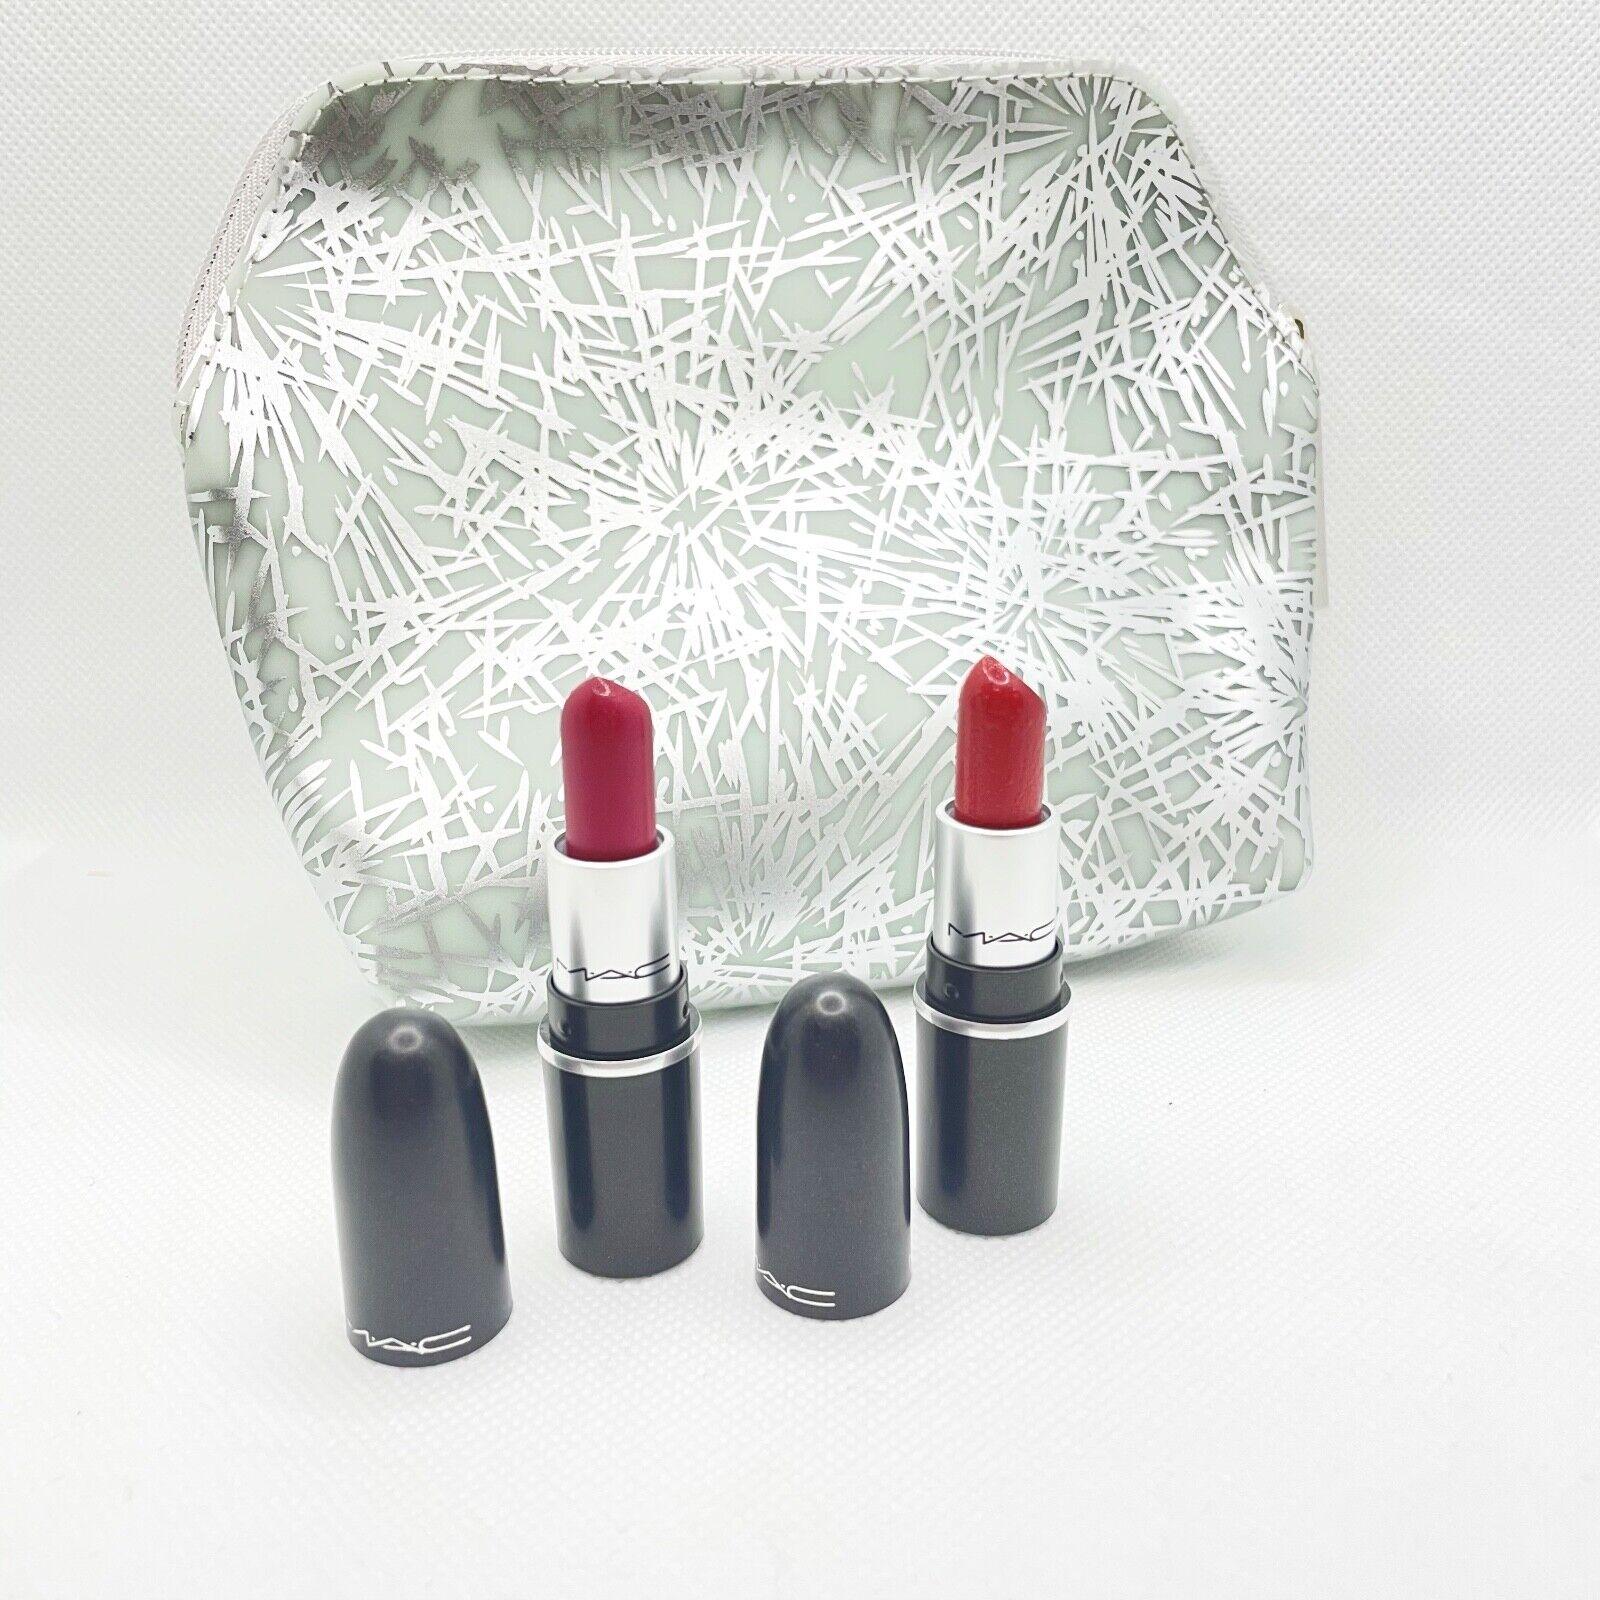 Mac Mini Lipstick Set - Limited Edition